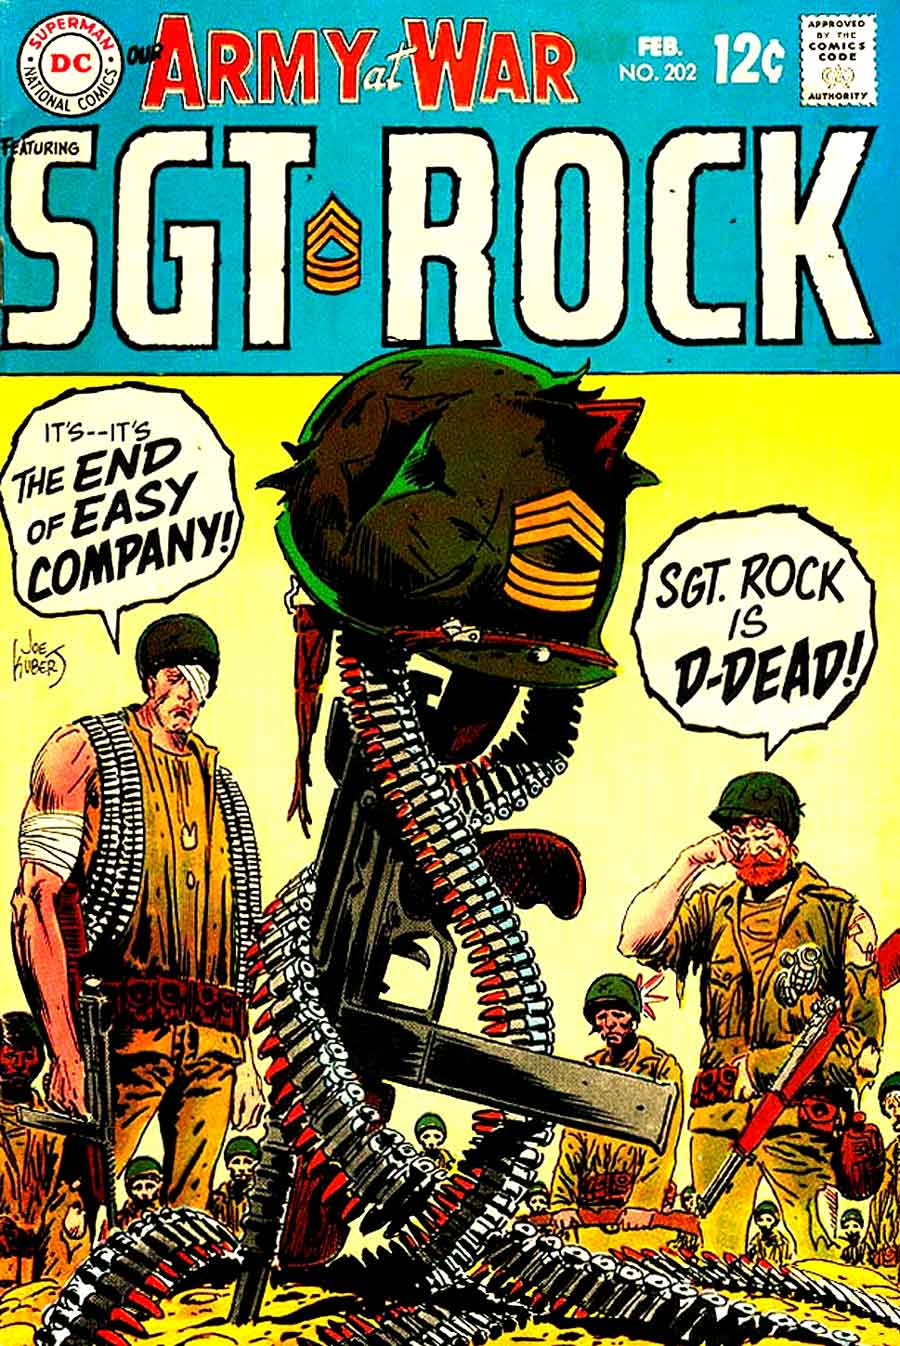 Simple Comic Book Covers : Our army at war joe kubert art cover pencil ink